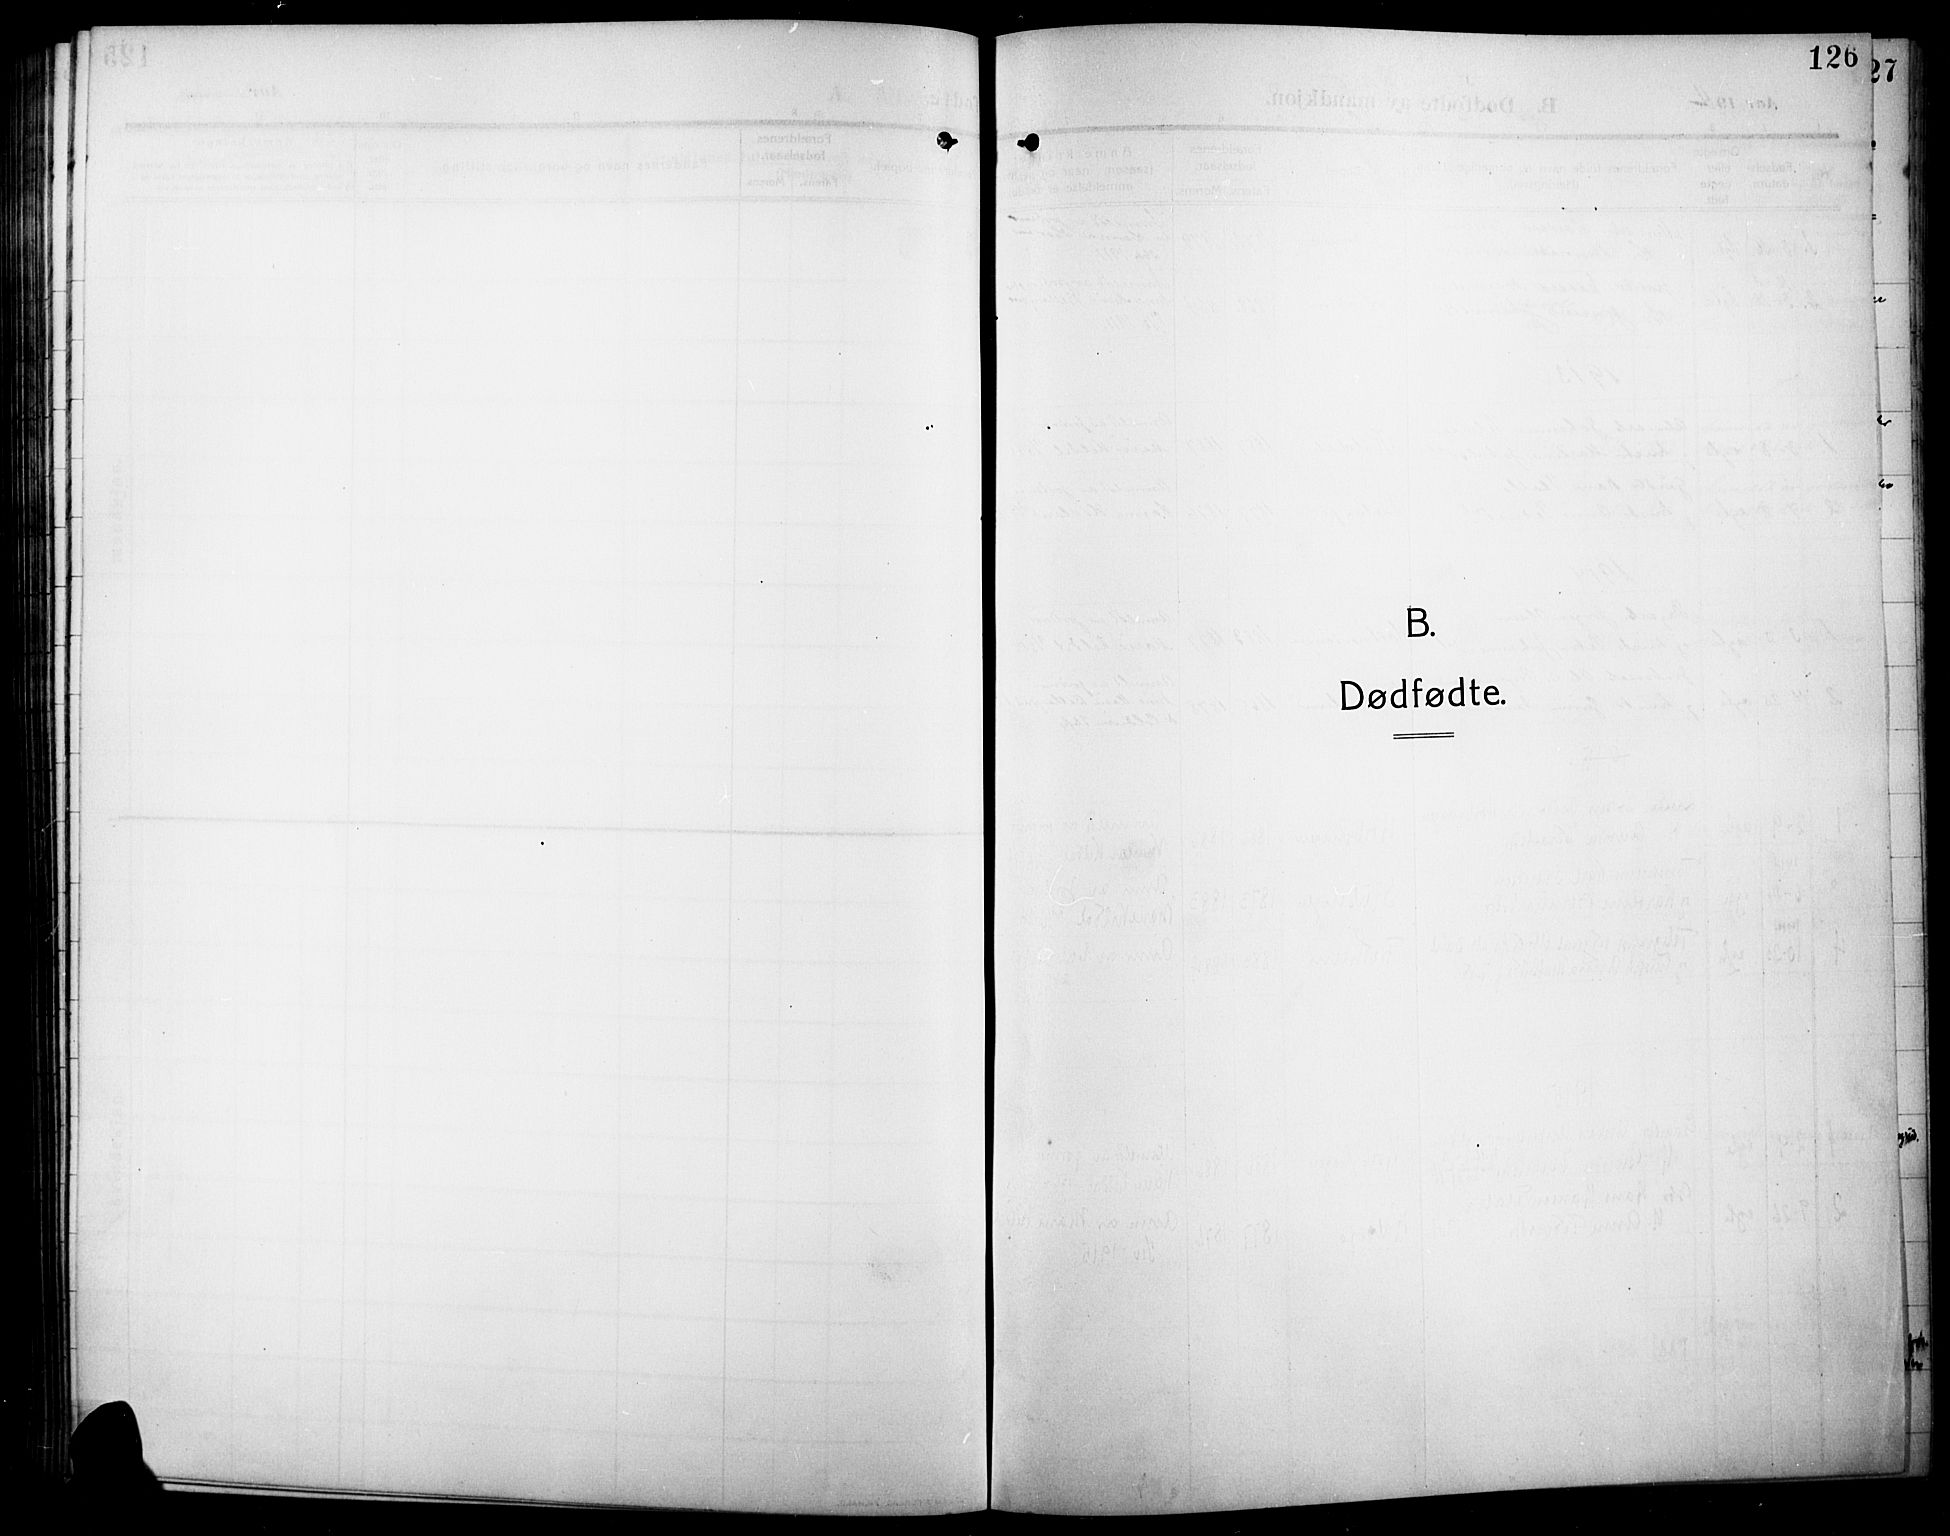 SAH, Lunner prestekontor, H/Ha/Hab/L0001: Klokkerbok nr. 1, 1909-1922, s. 126